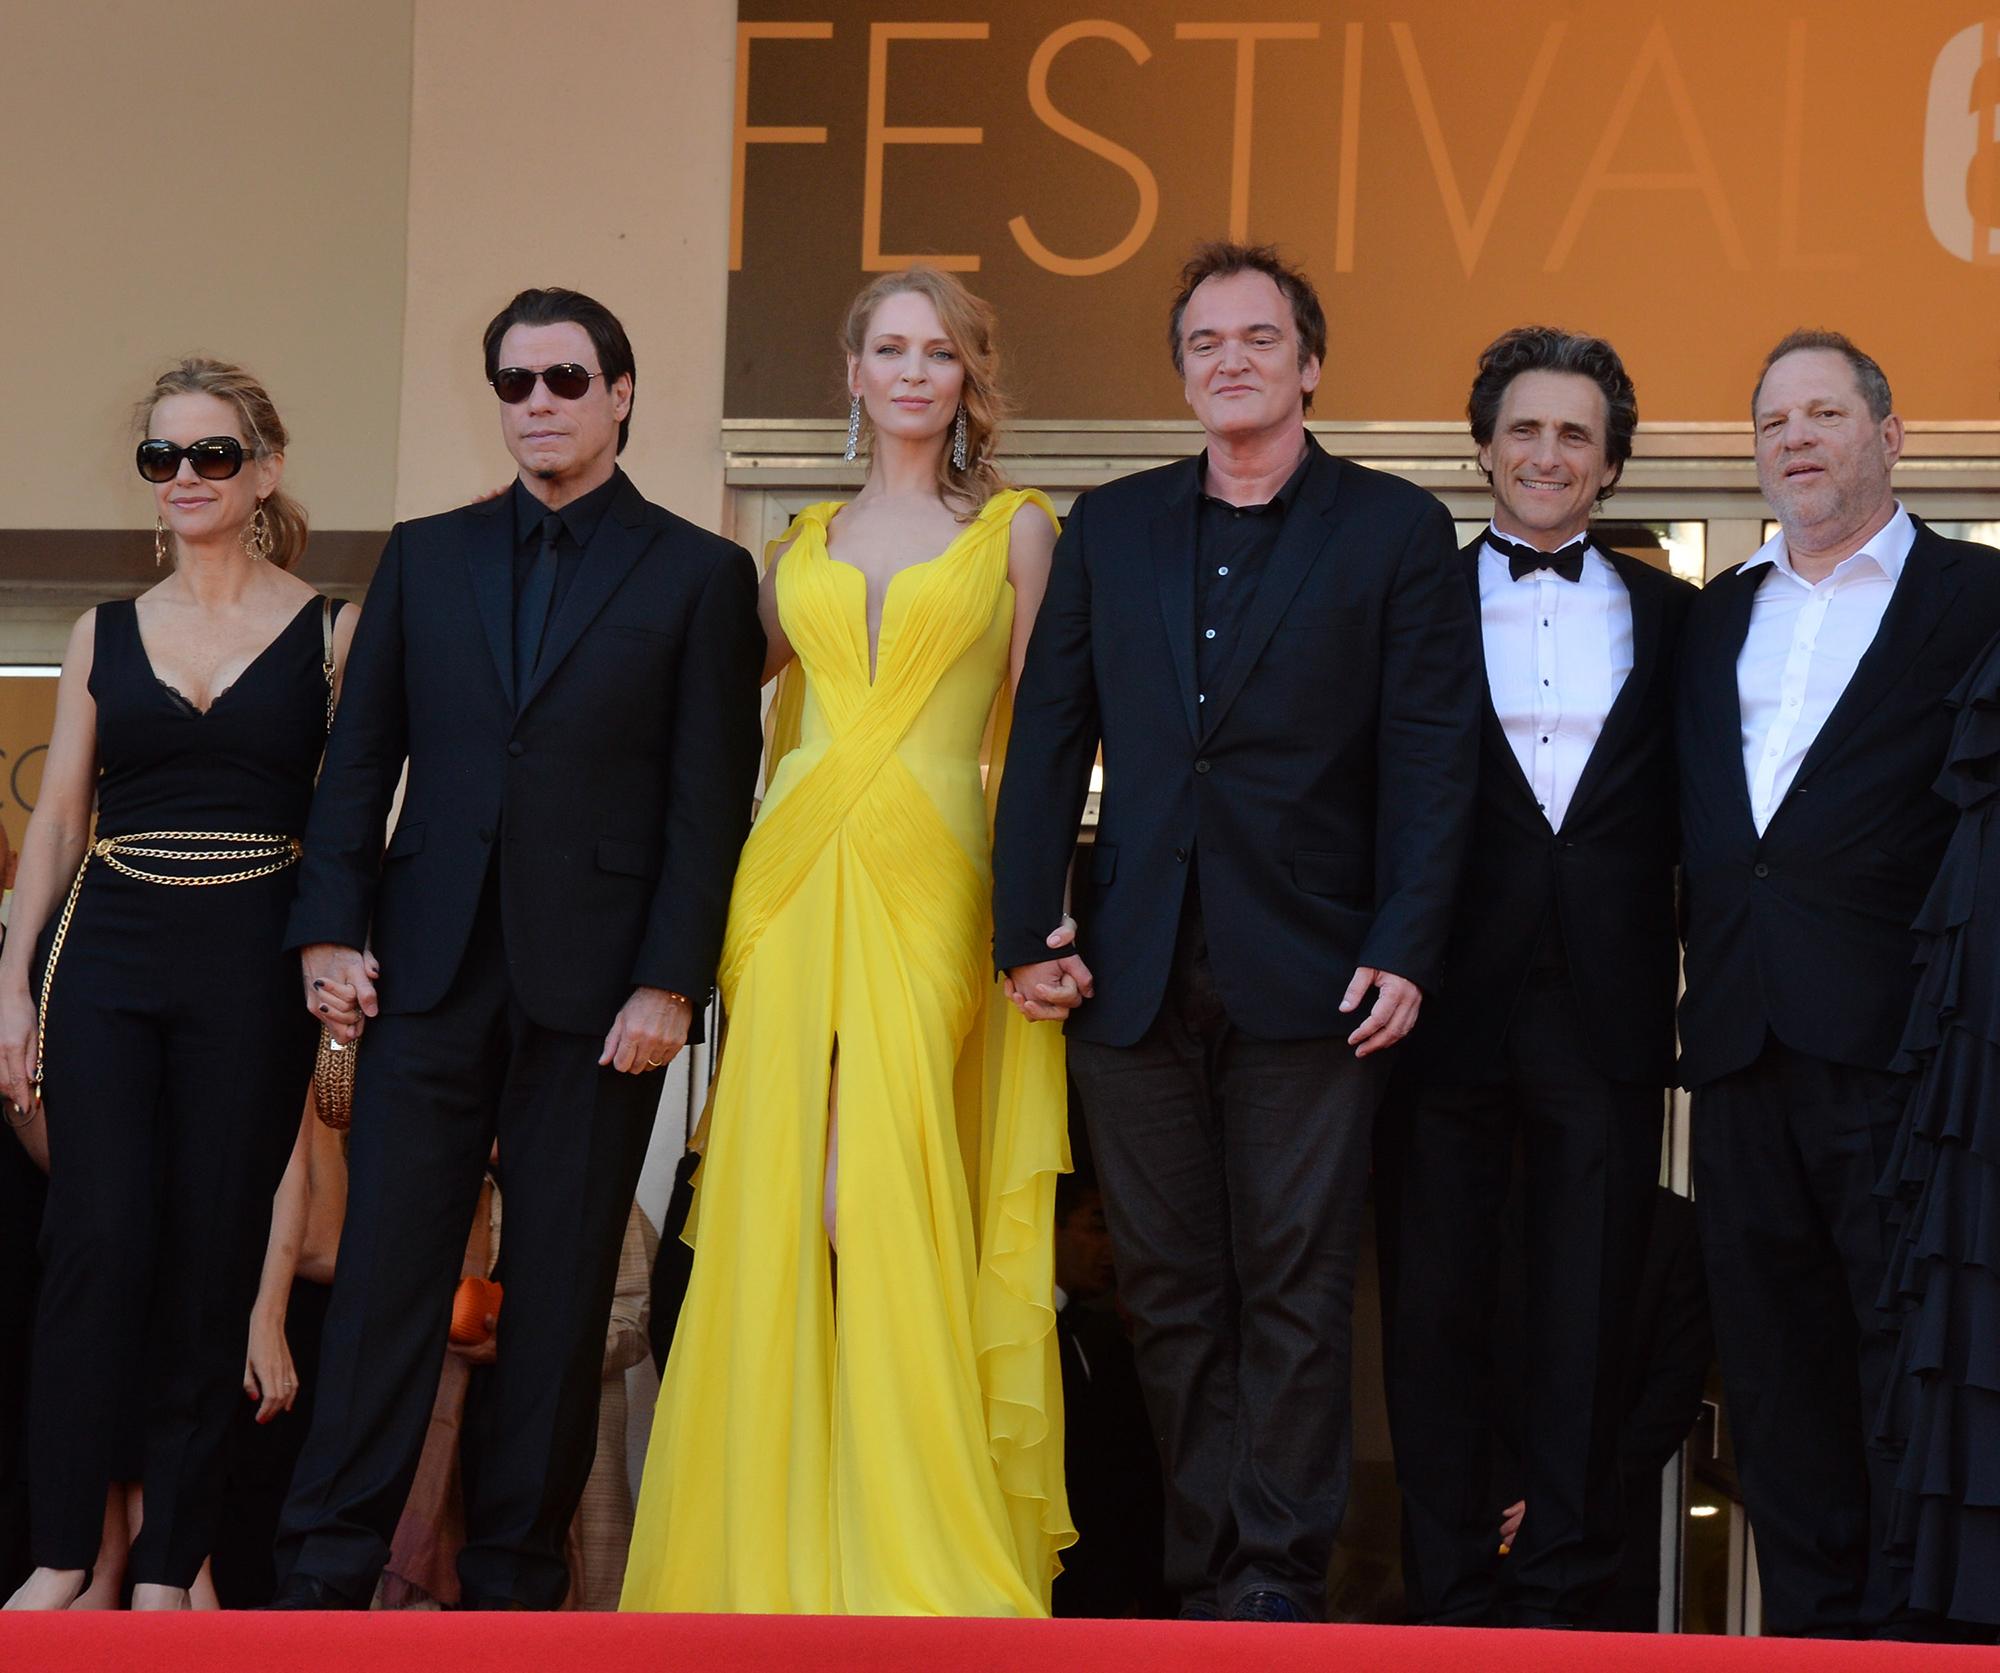 ¿'Kill Bill Vol. 3'? Quentin Tarantino deja ver esta posibilidad